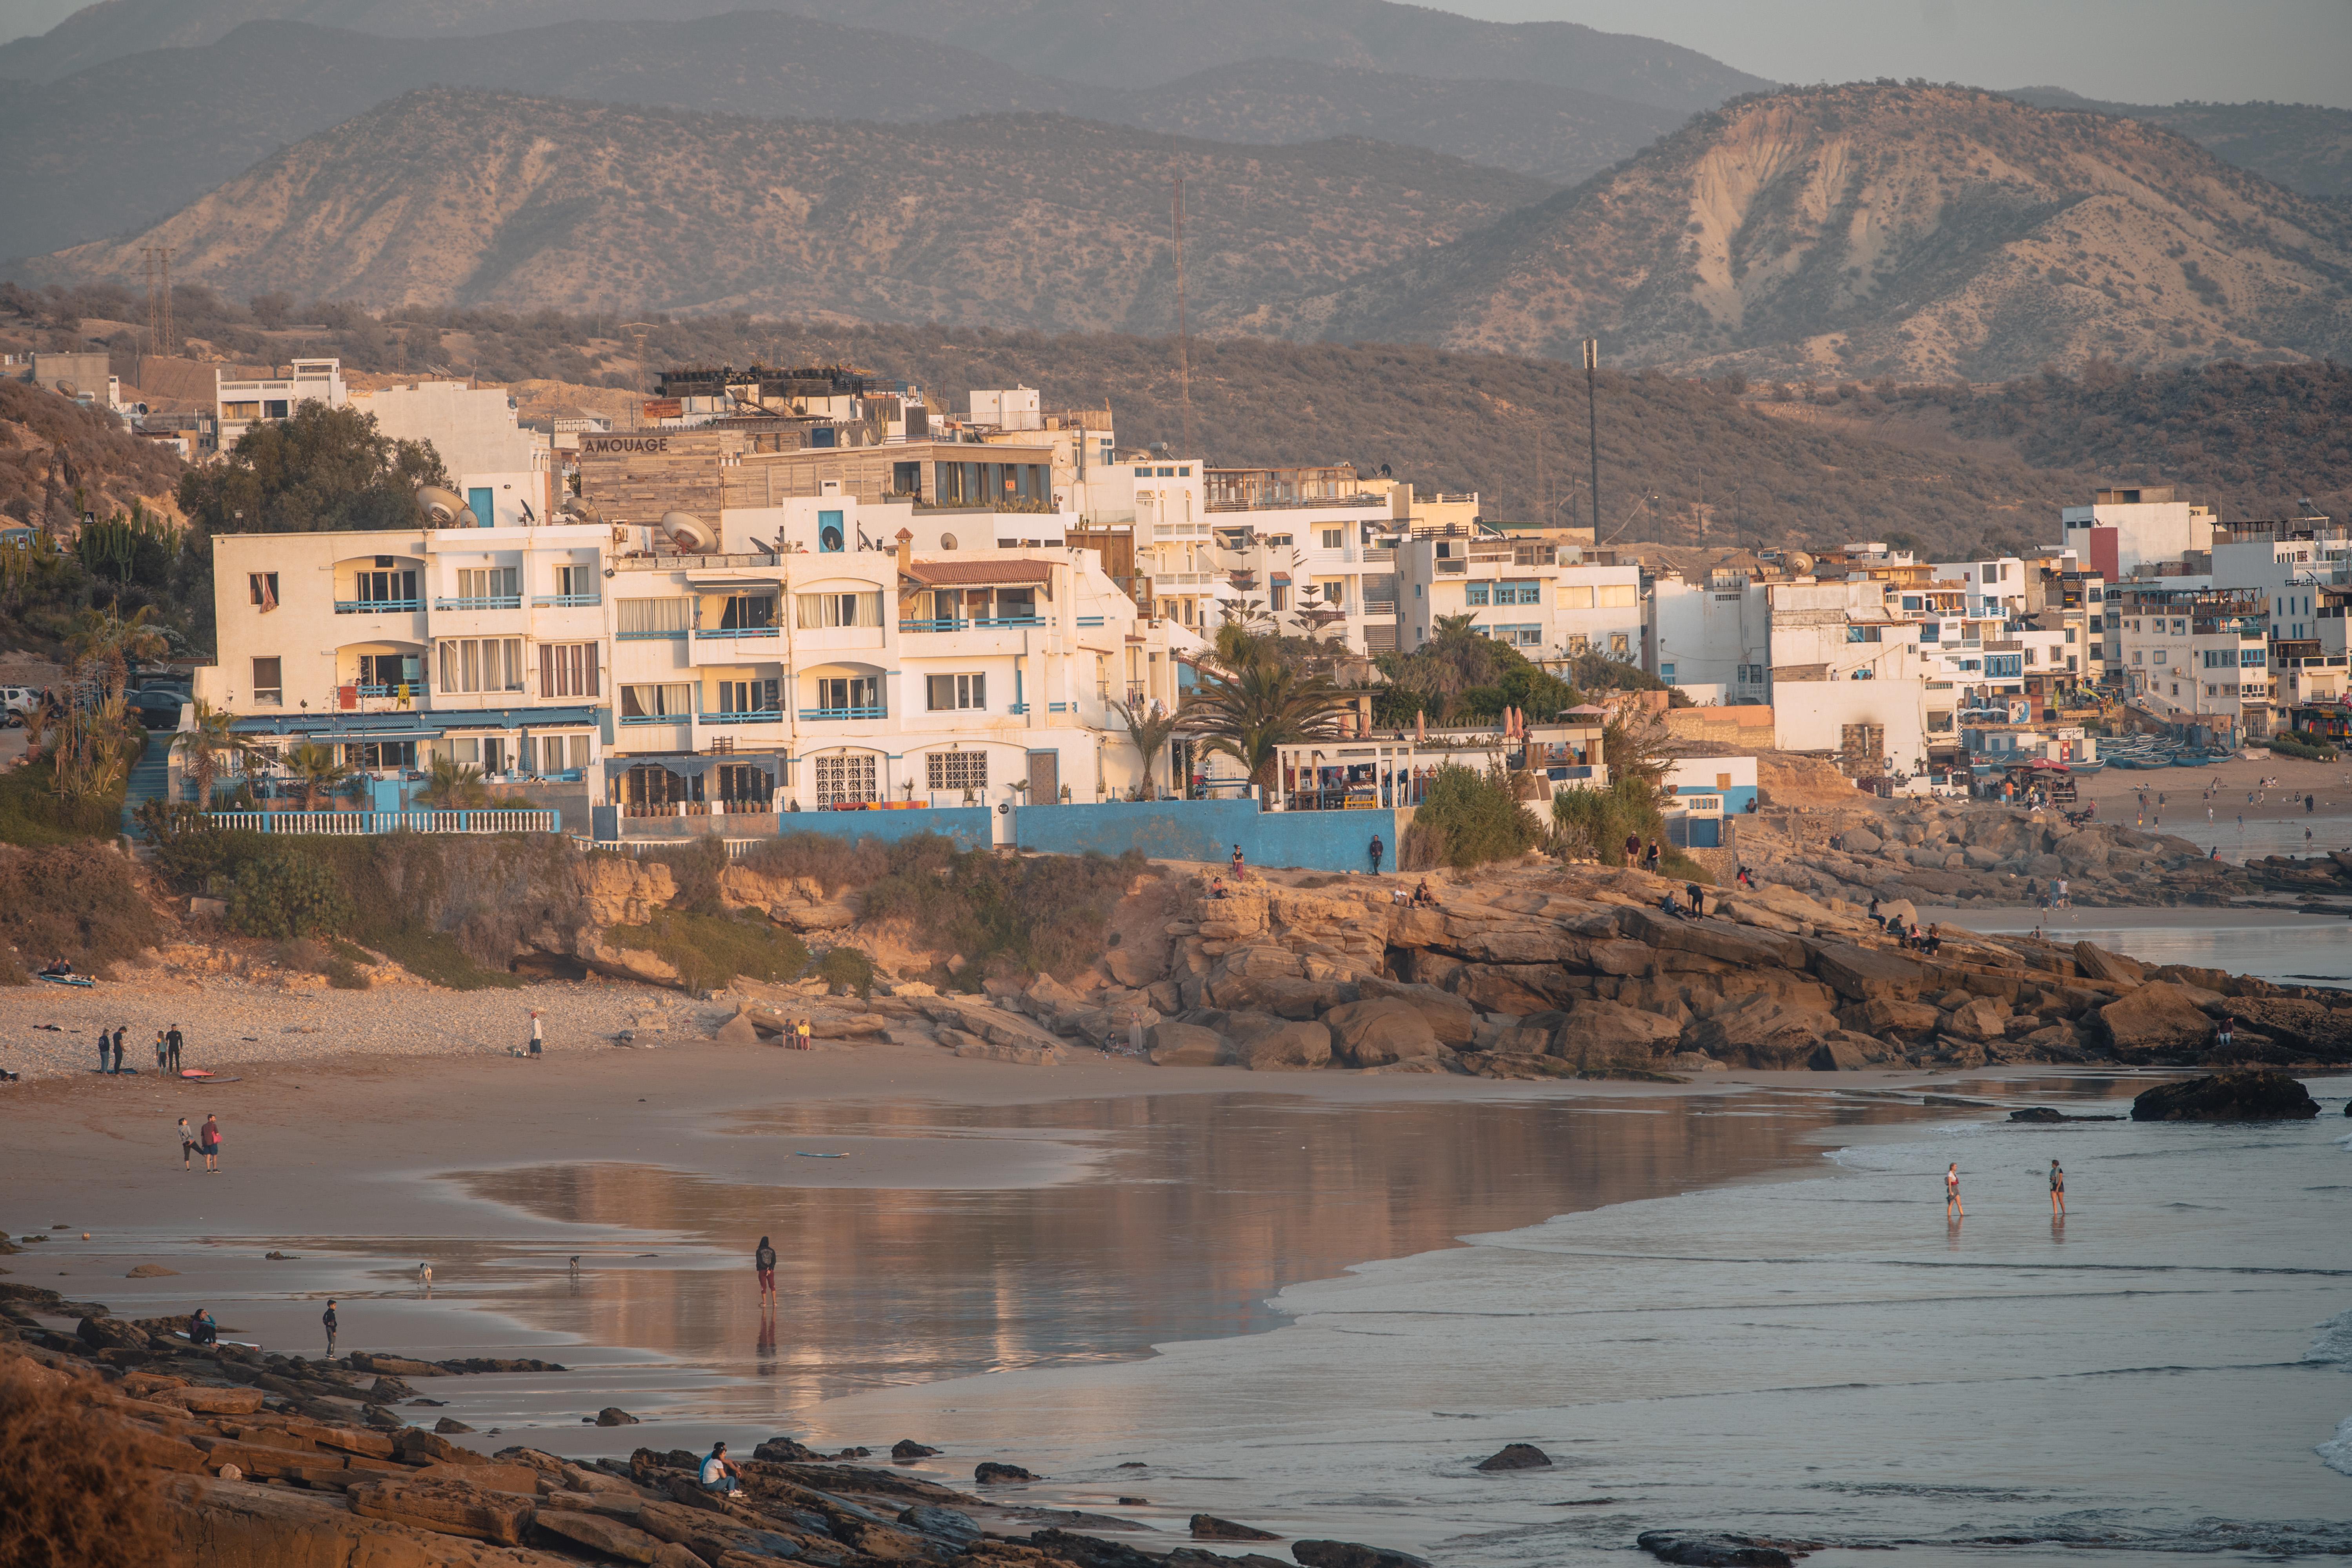 Taghazout/Maroc